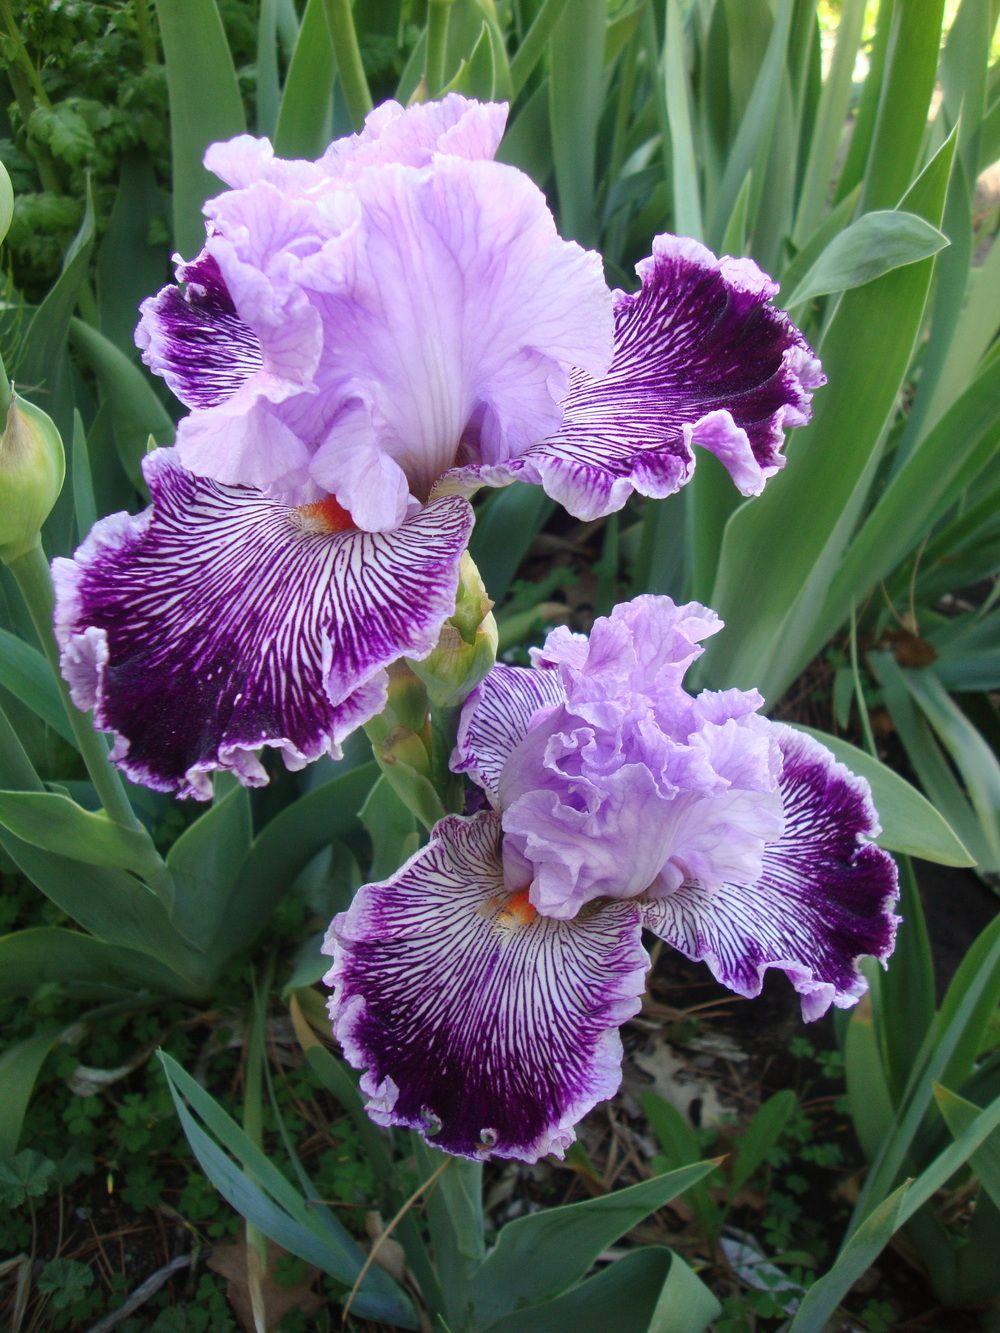 Iris captain thunderbolt blyth11 blooms pinterest iris iris captain thunderbolt blyth11 izmirmasajfo